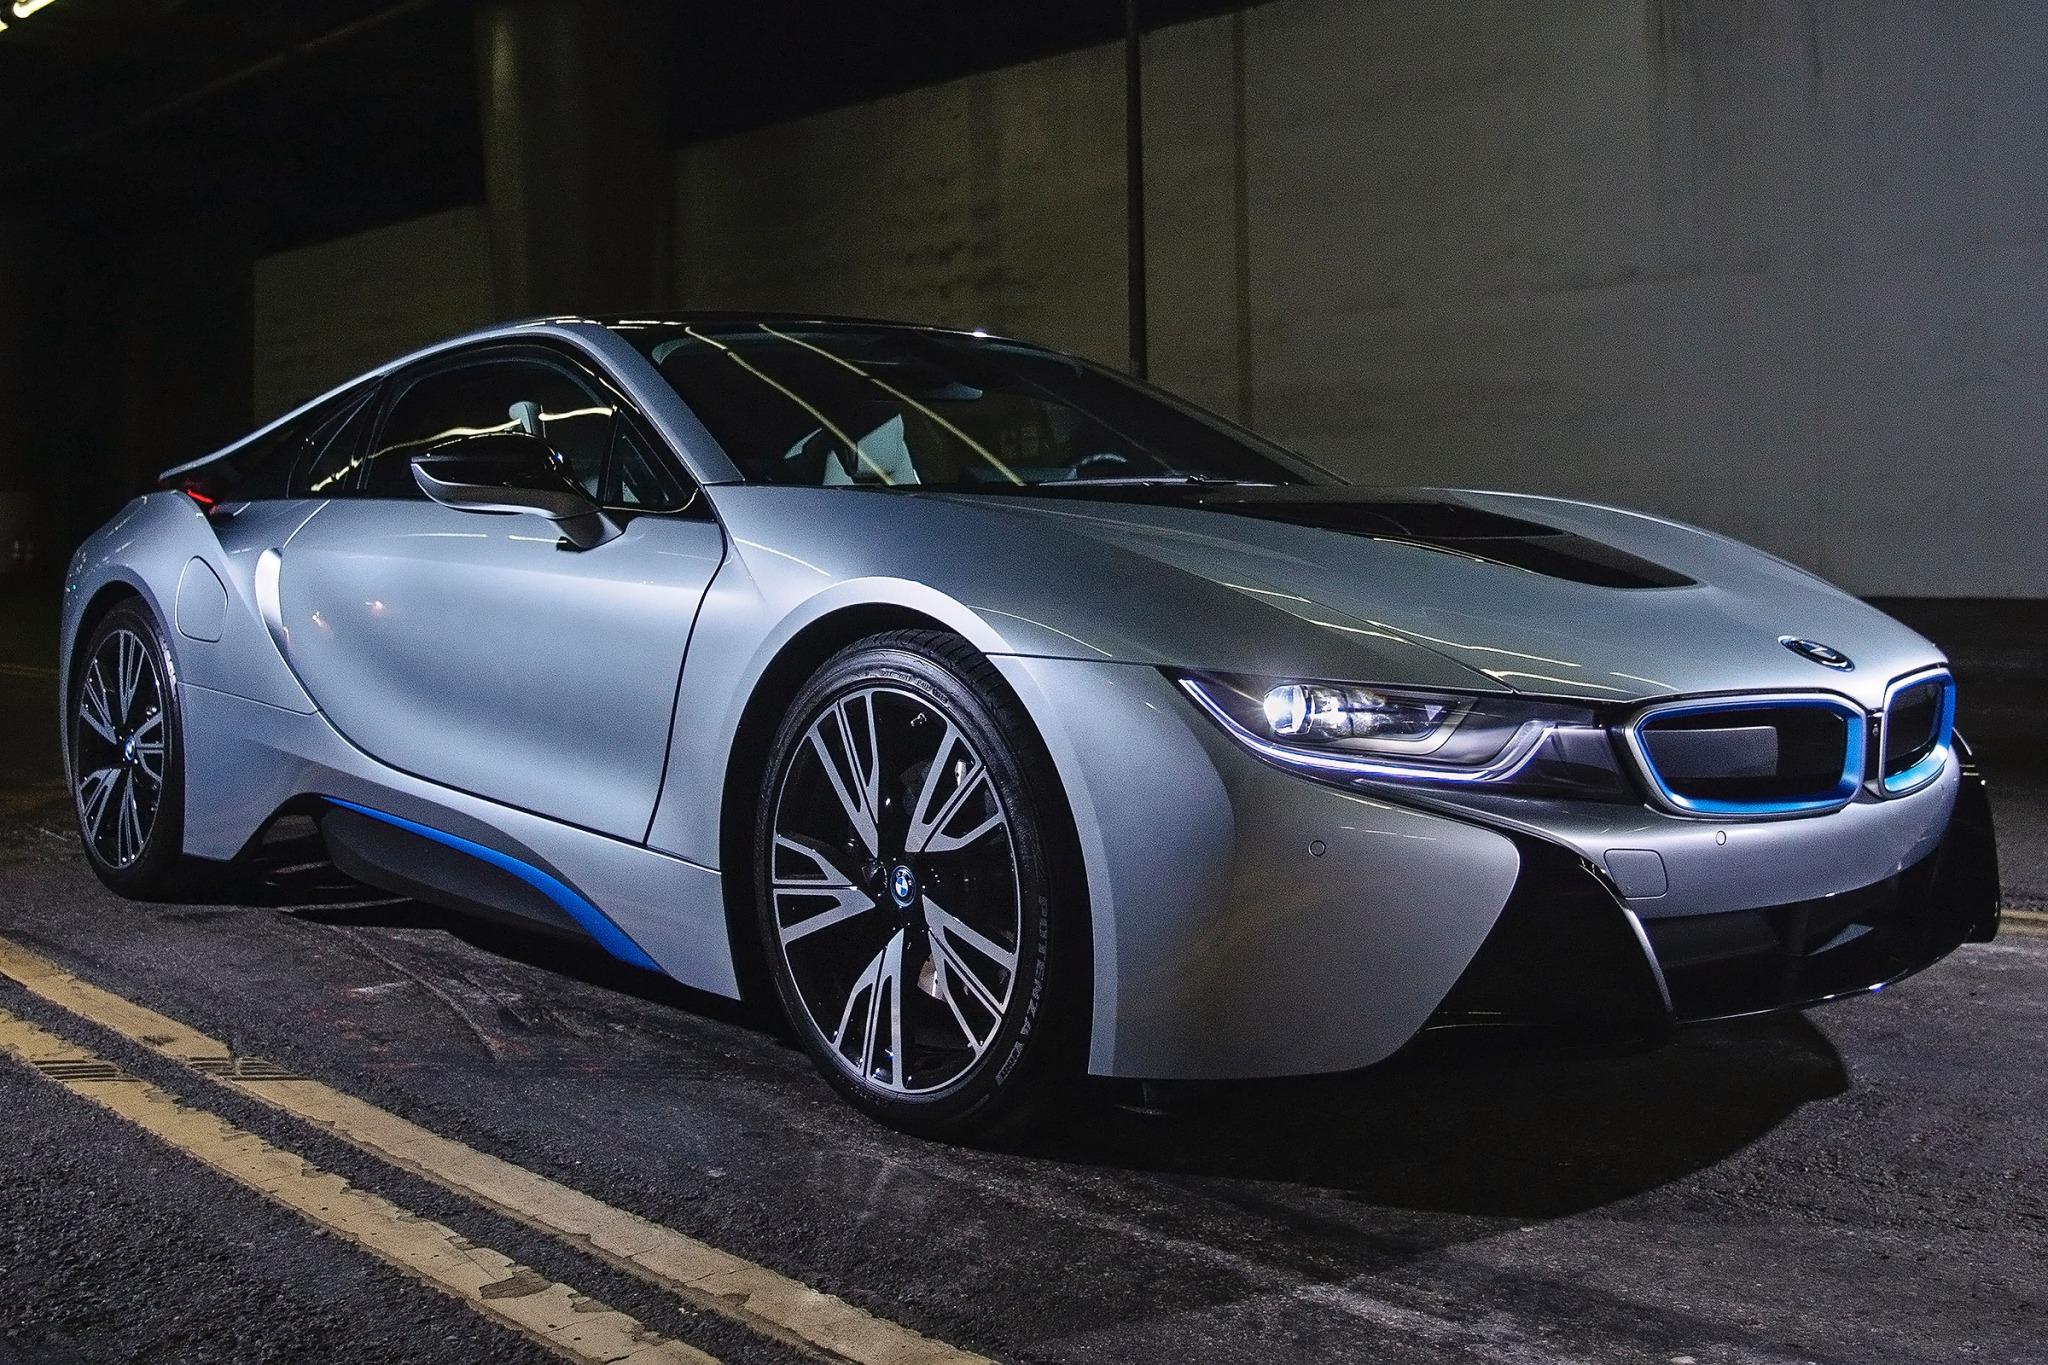 2014 BMW i8 VINs, Configurations, MSRP & Specs - AutoDetective